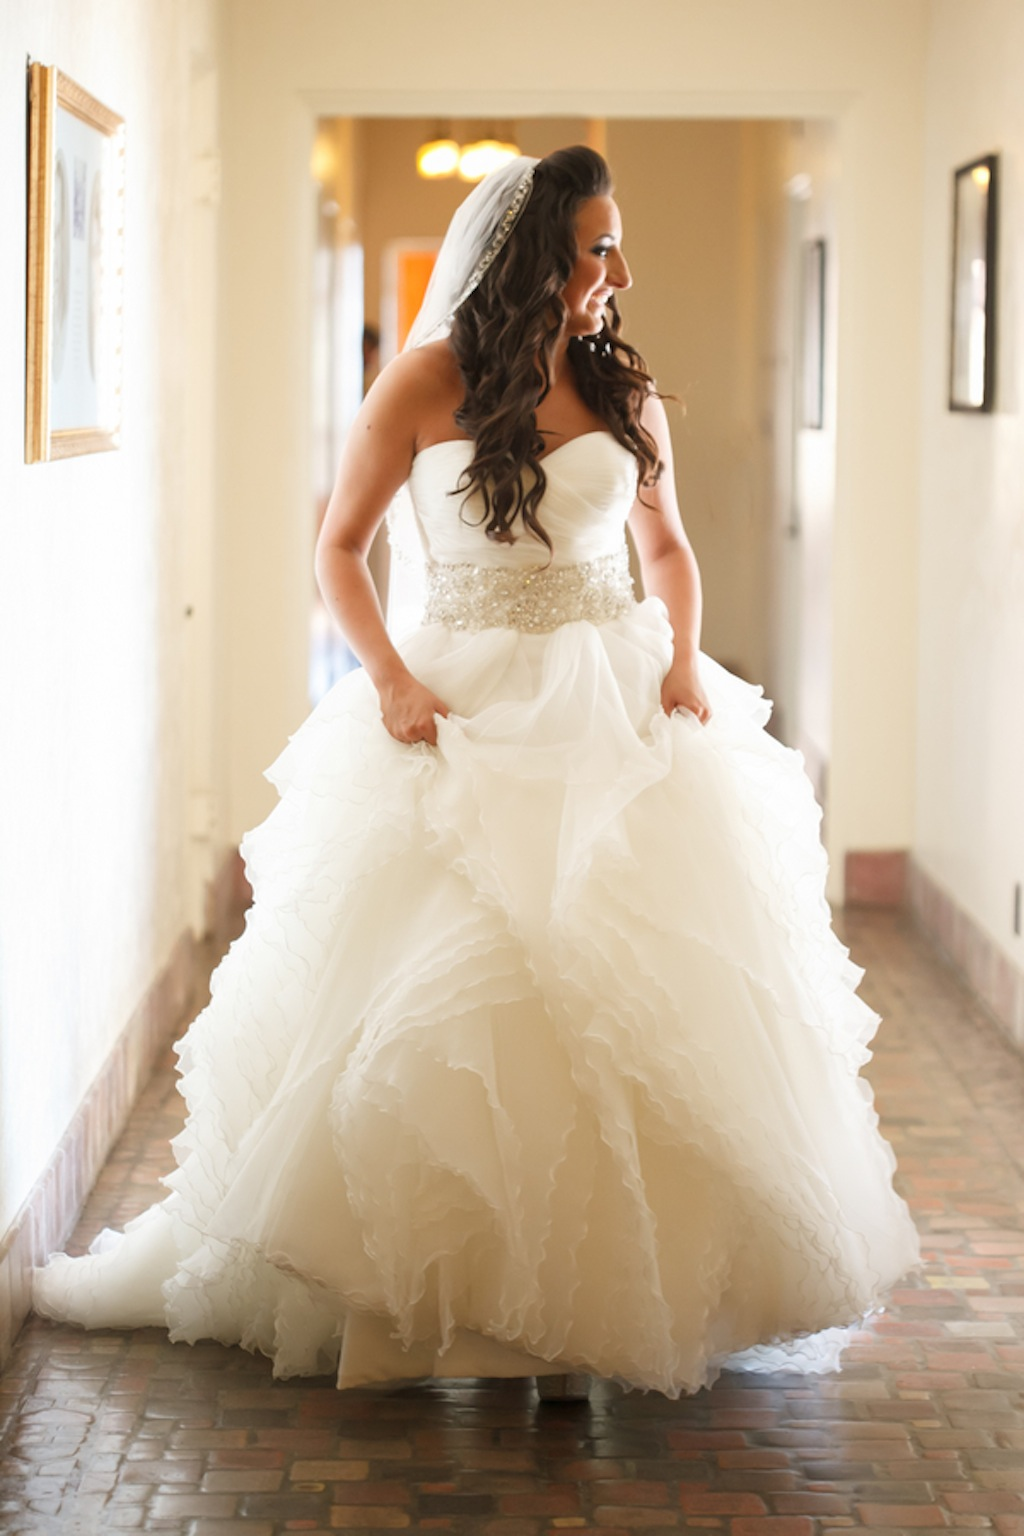 Justin Alexander Wedding Dress with Rhinestone Belt